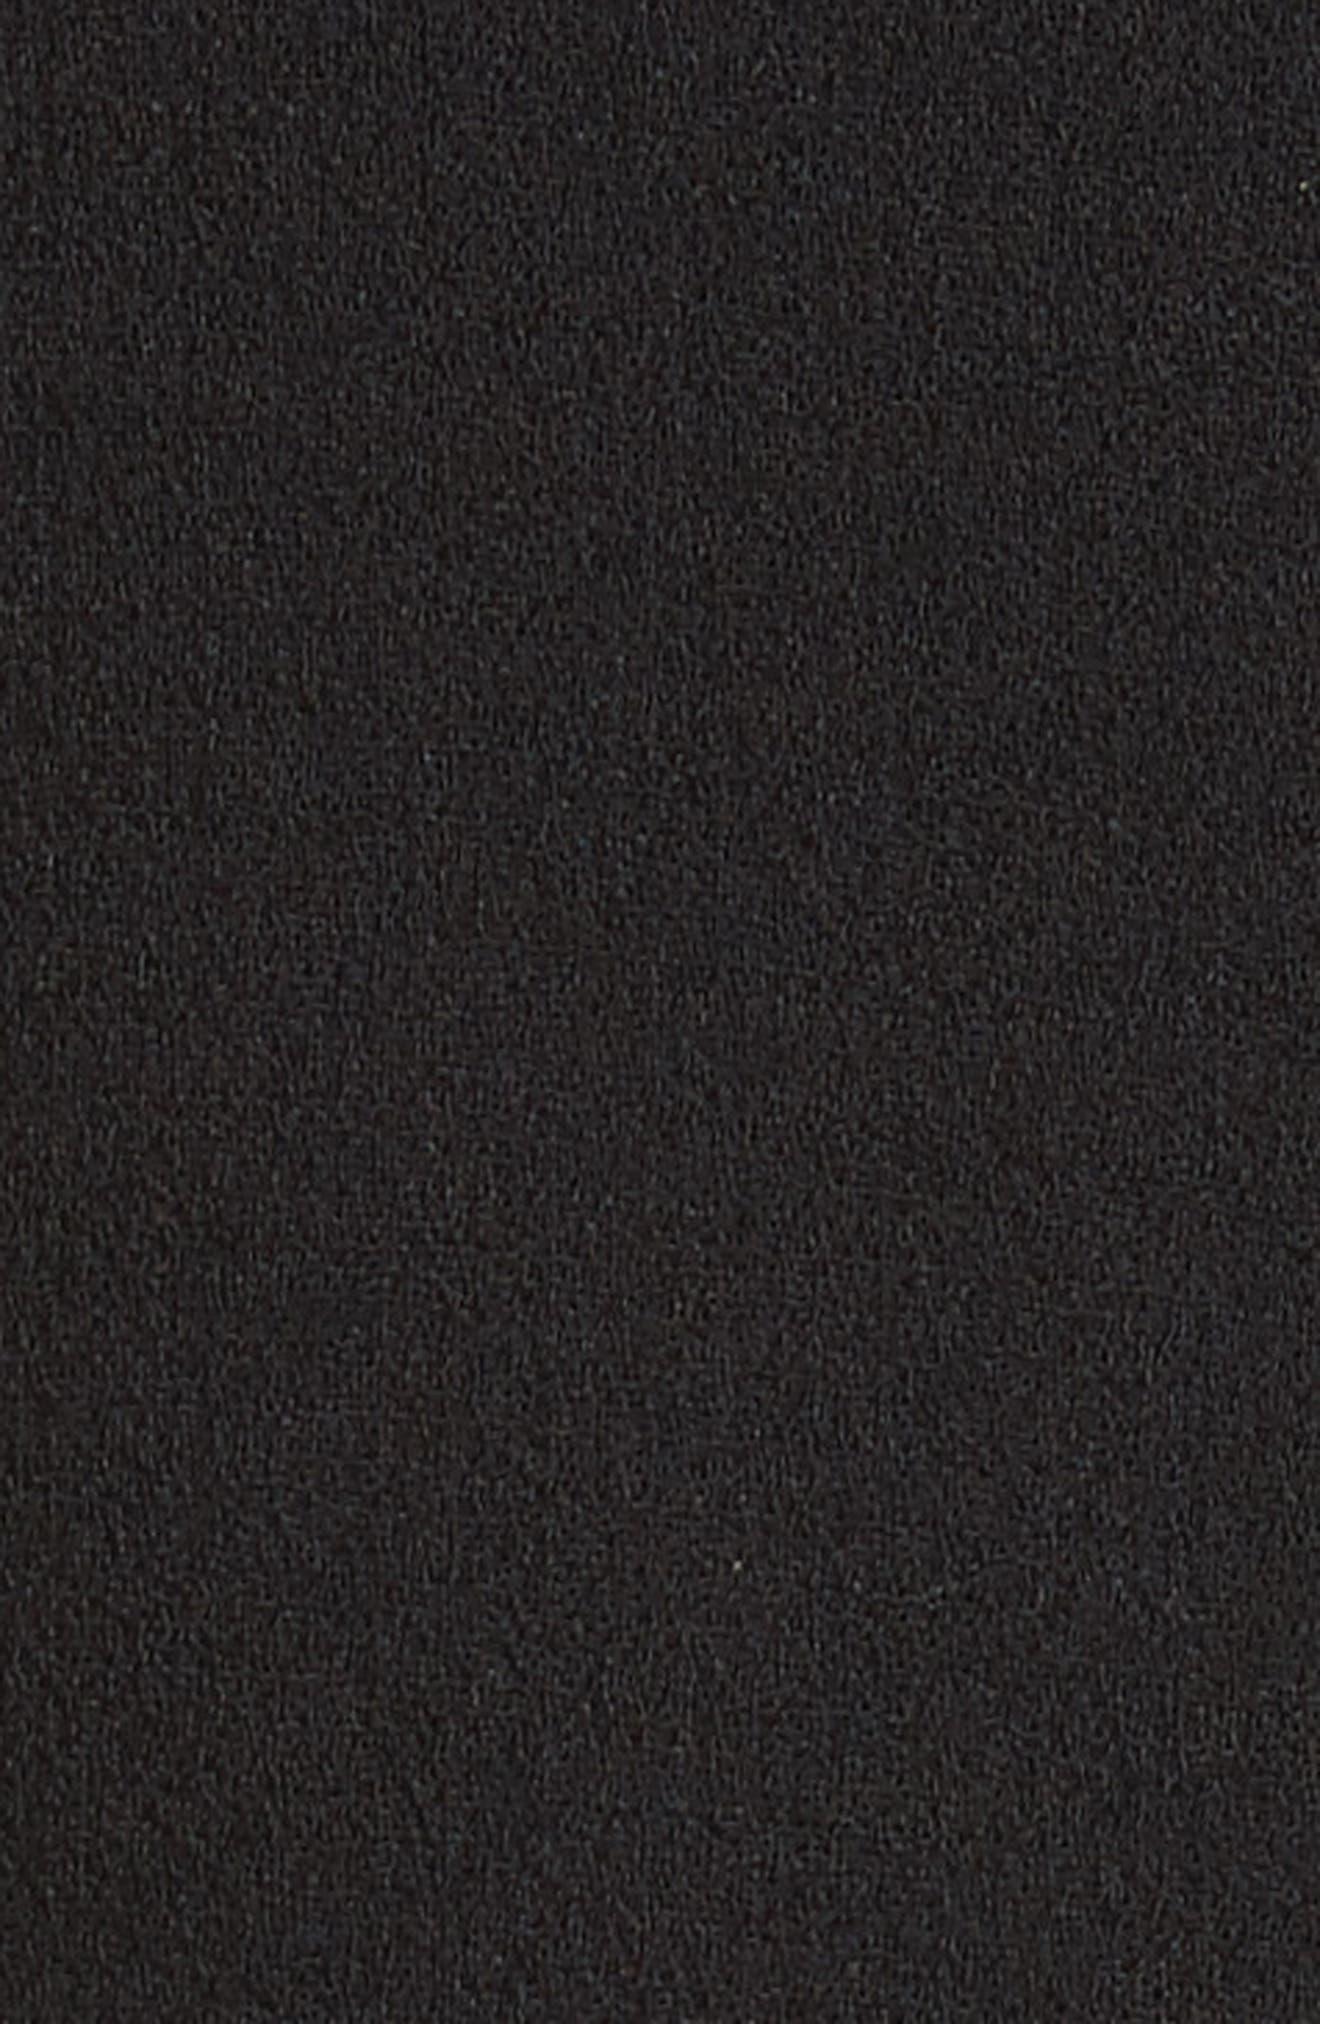 Alternate Image 5  - Michael Kors Stretch Bouclé Crepe Sheath Dress